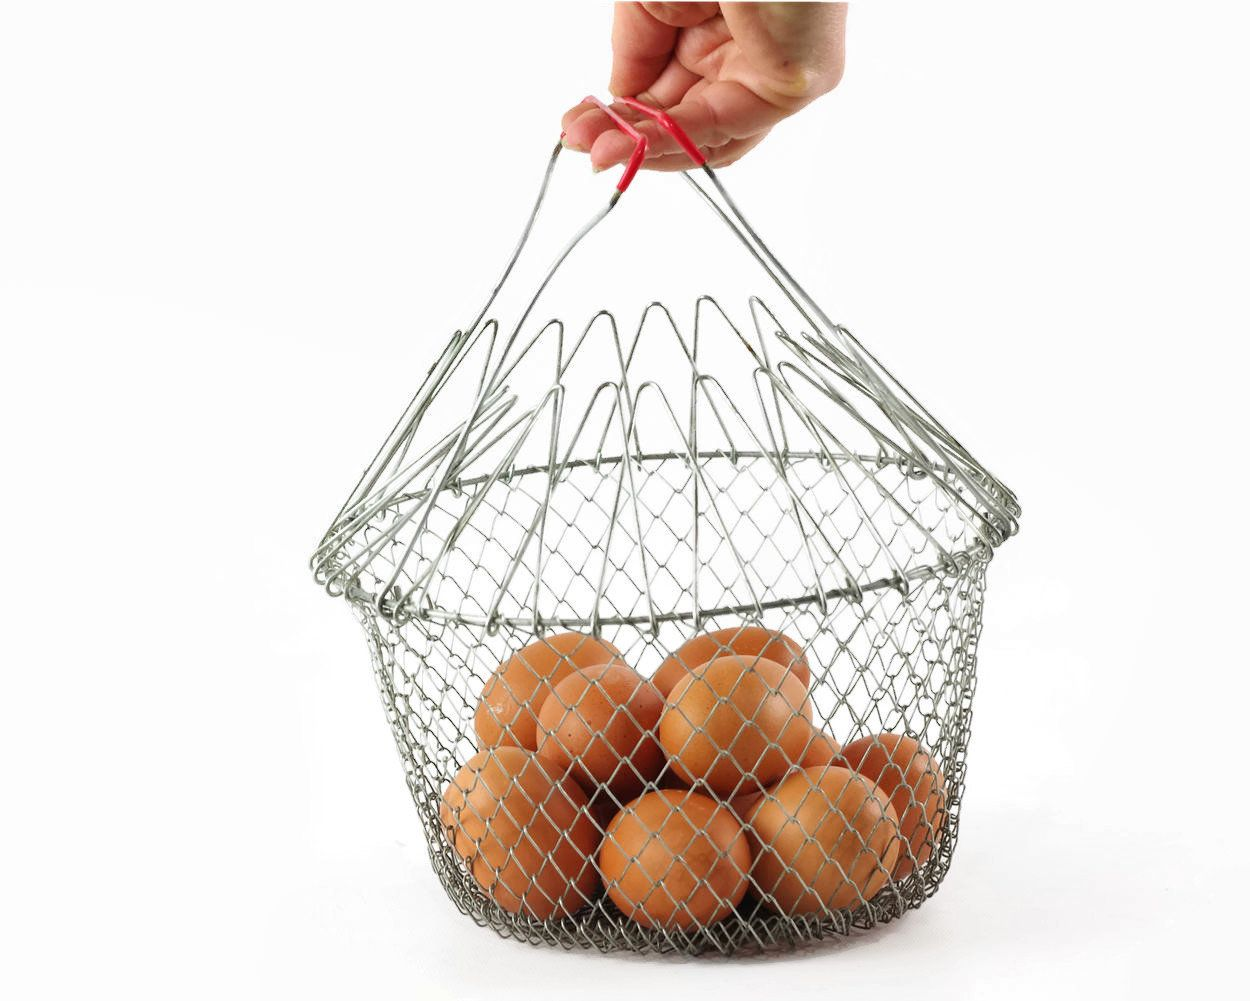 Vintage Wire Basket, Wire Kitchen Basket, Collapsible Egg